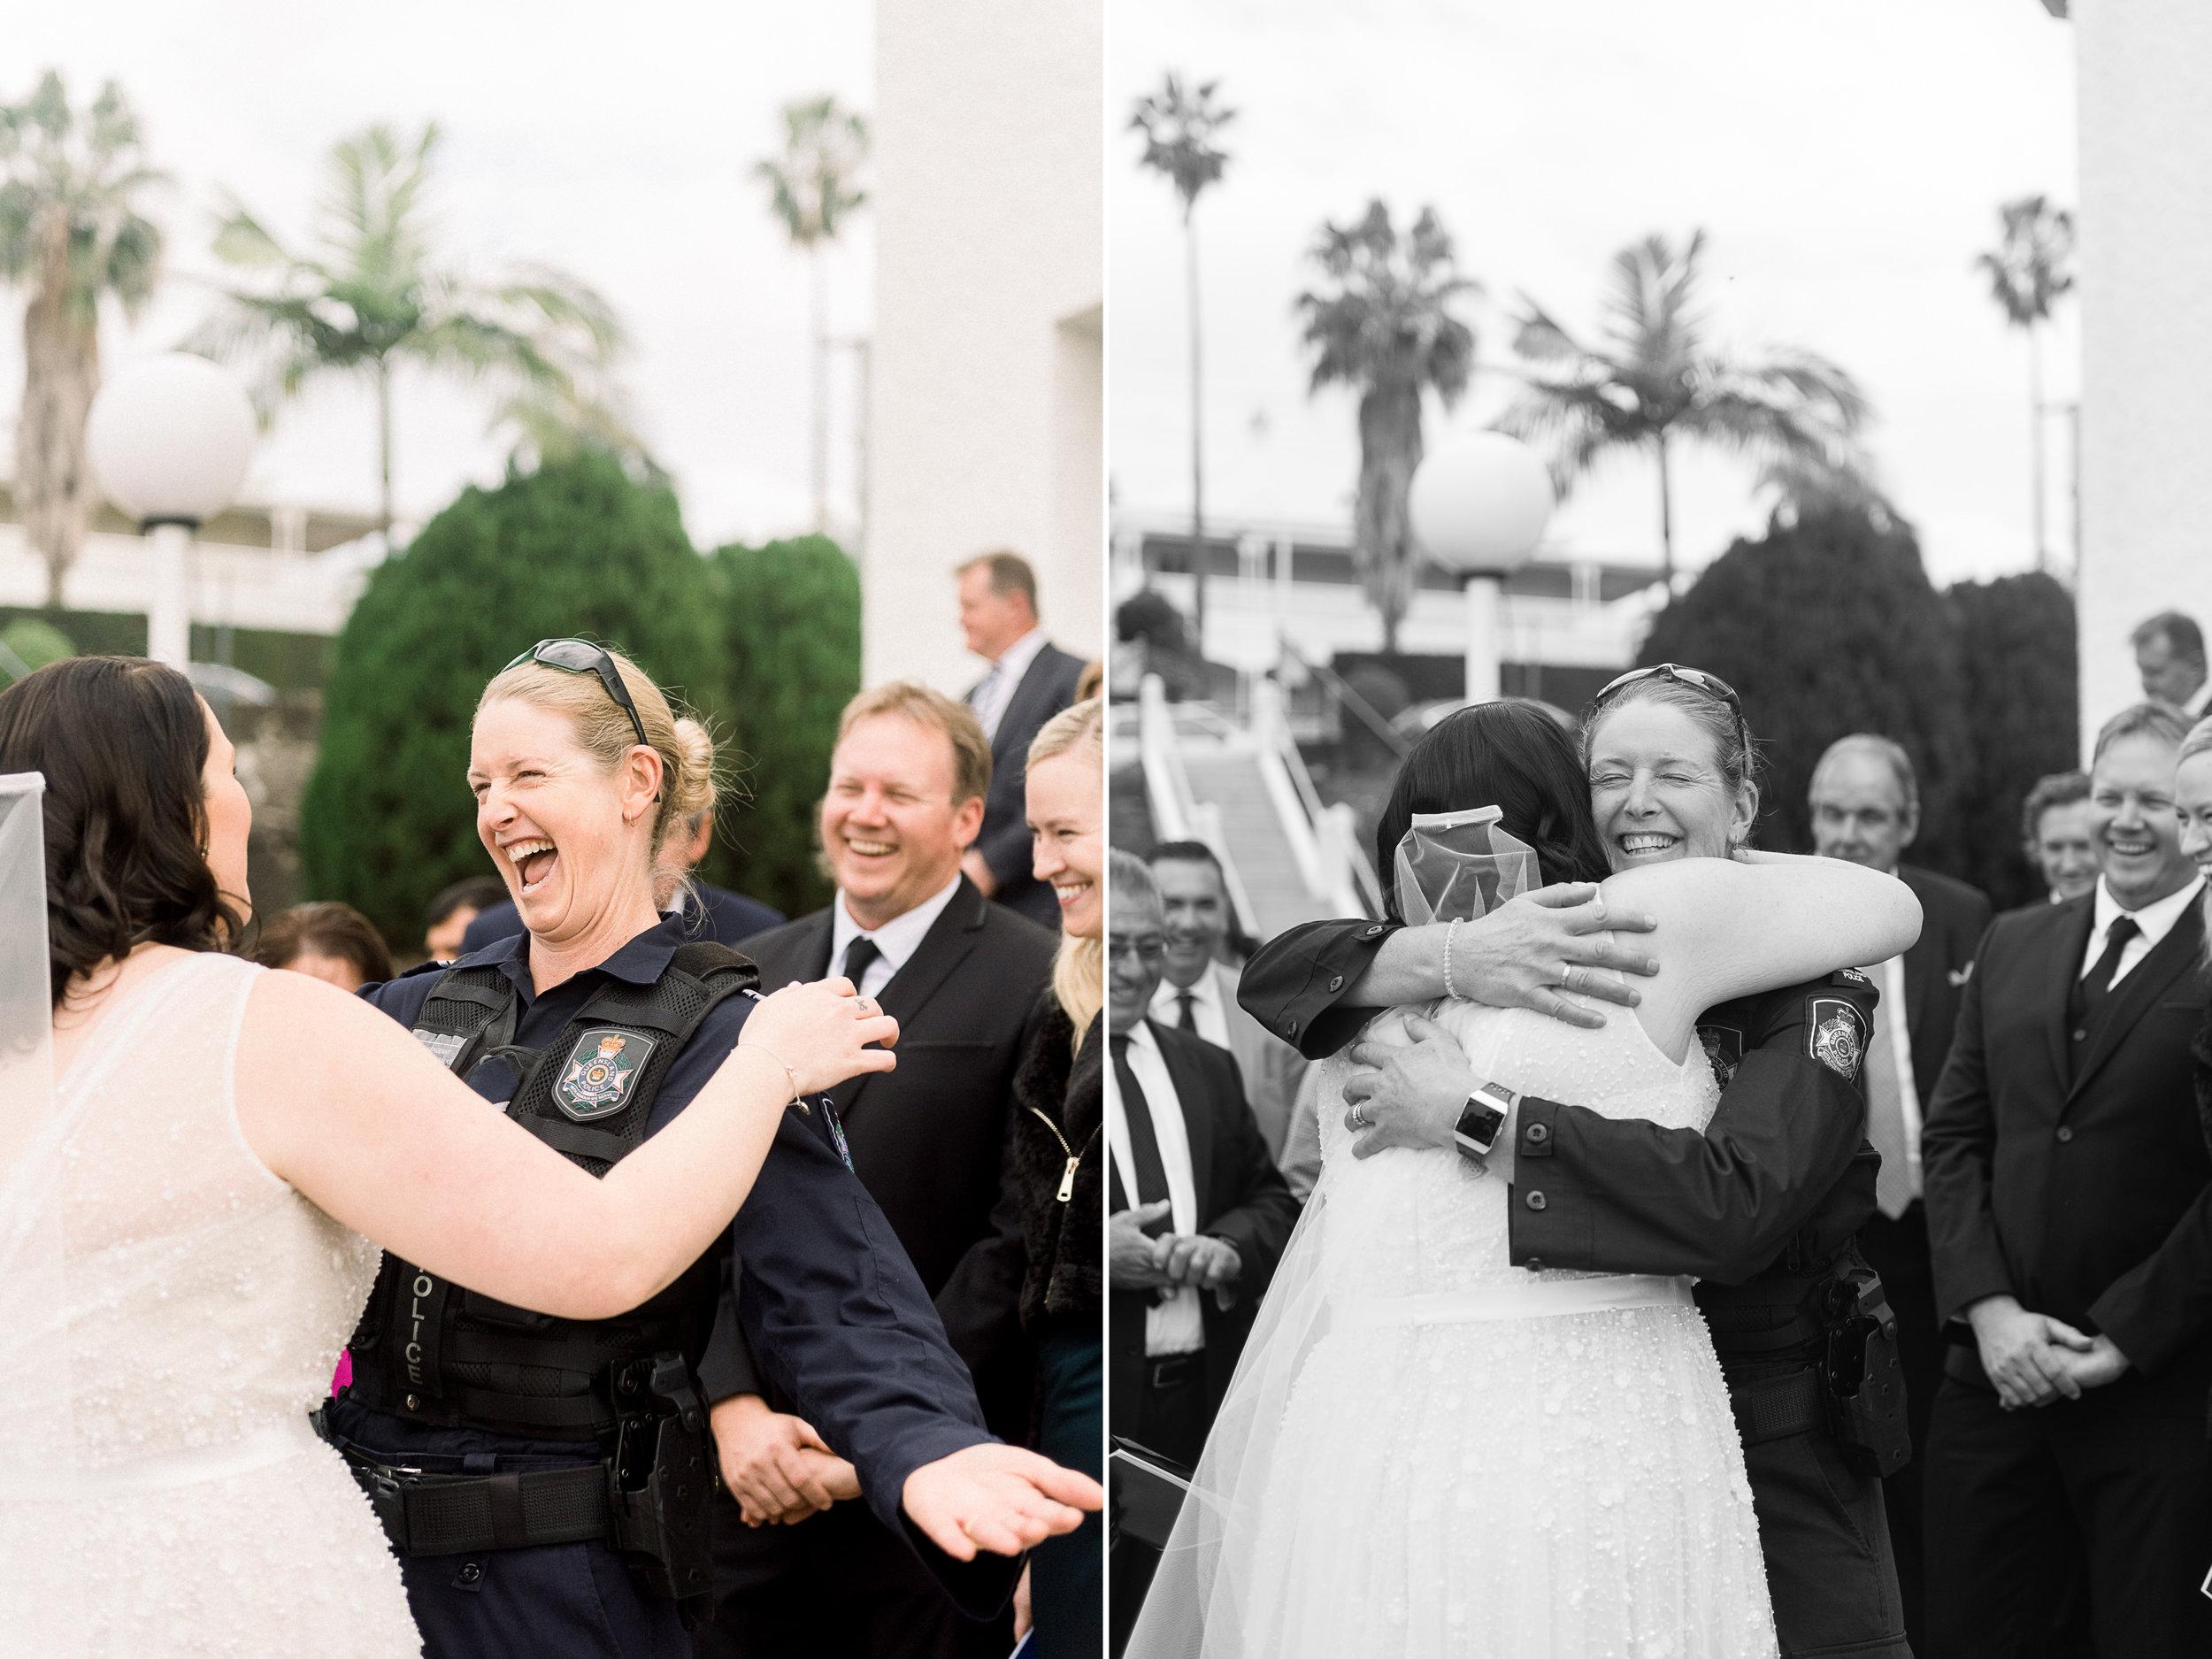 brisbane-city-wedding-church-ceremony-wedding-5.jpg